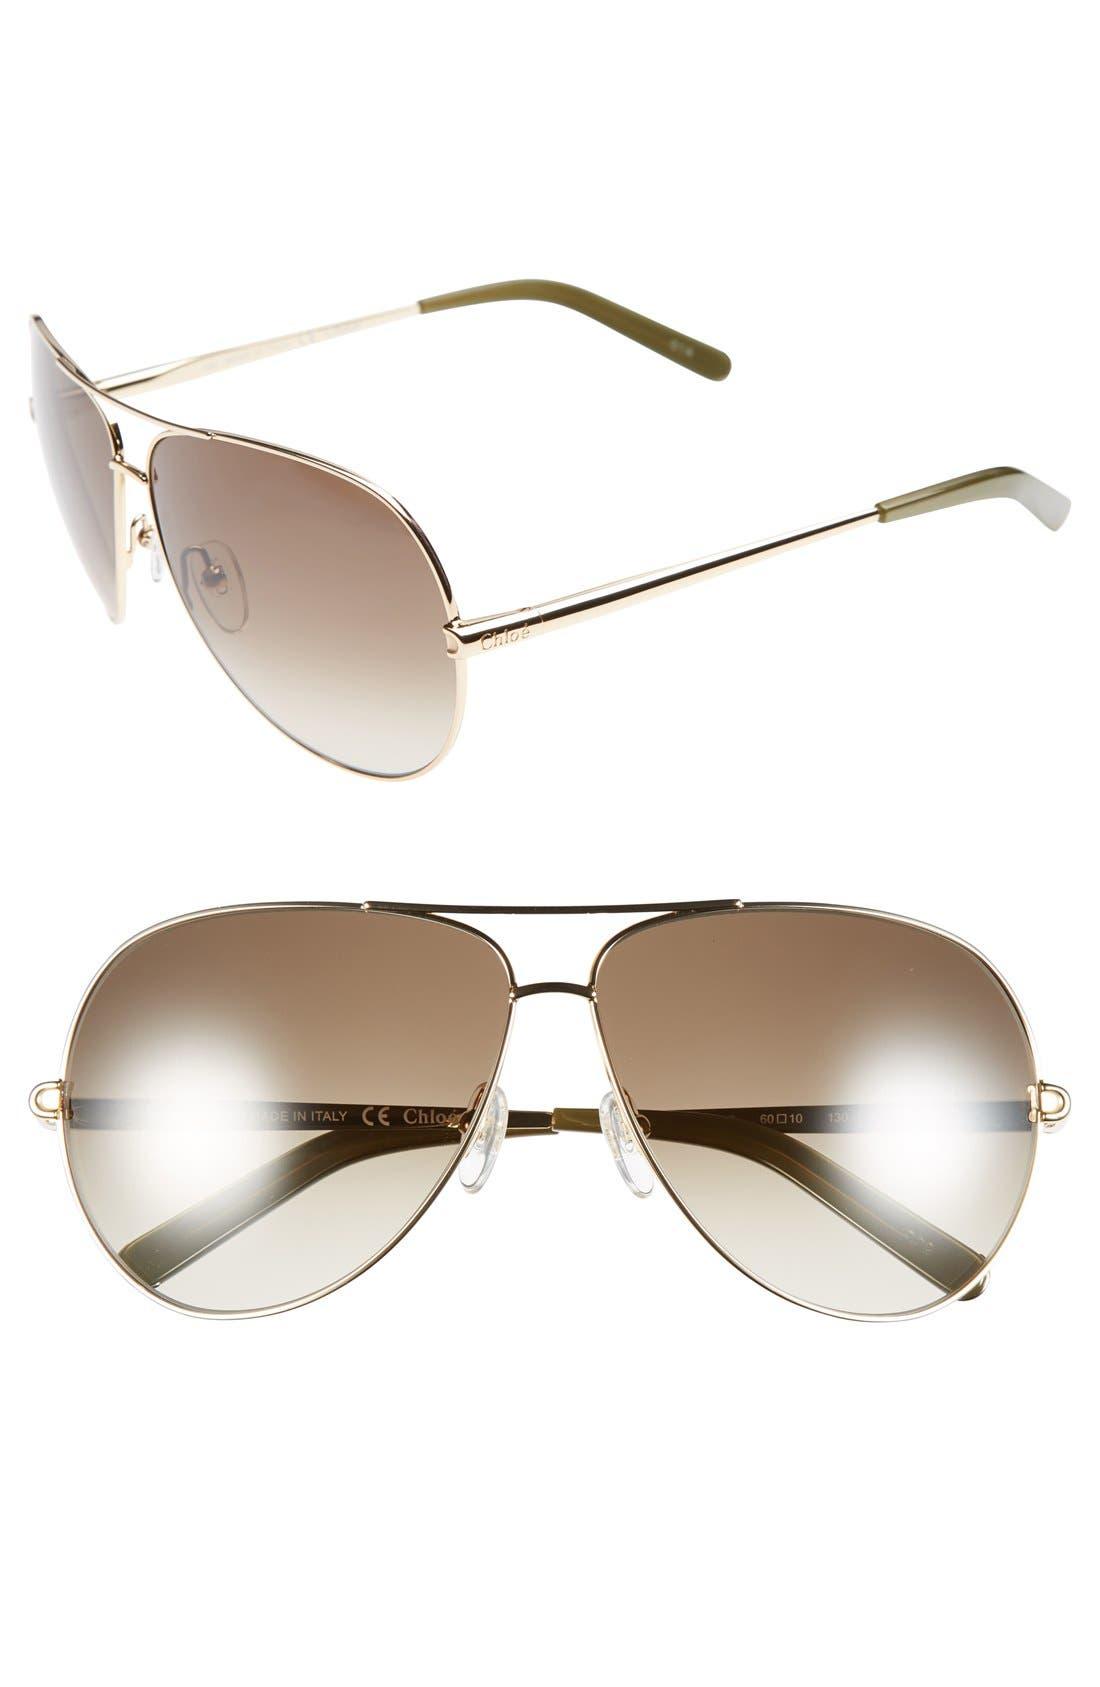 Main Image - Chloé 'Orme' 60mm Sunglasses